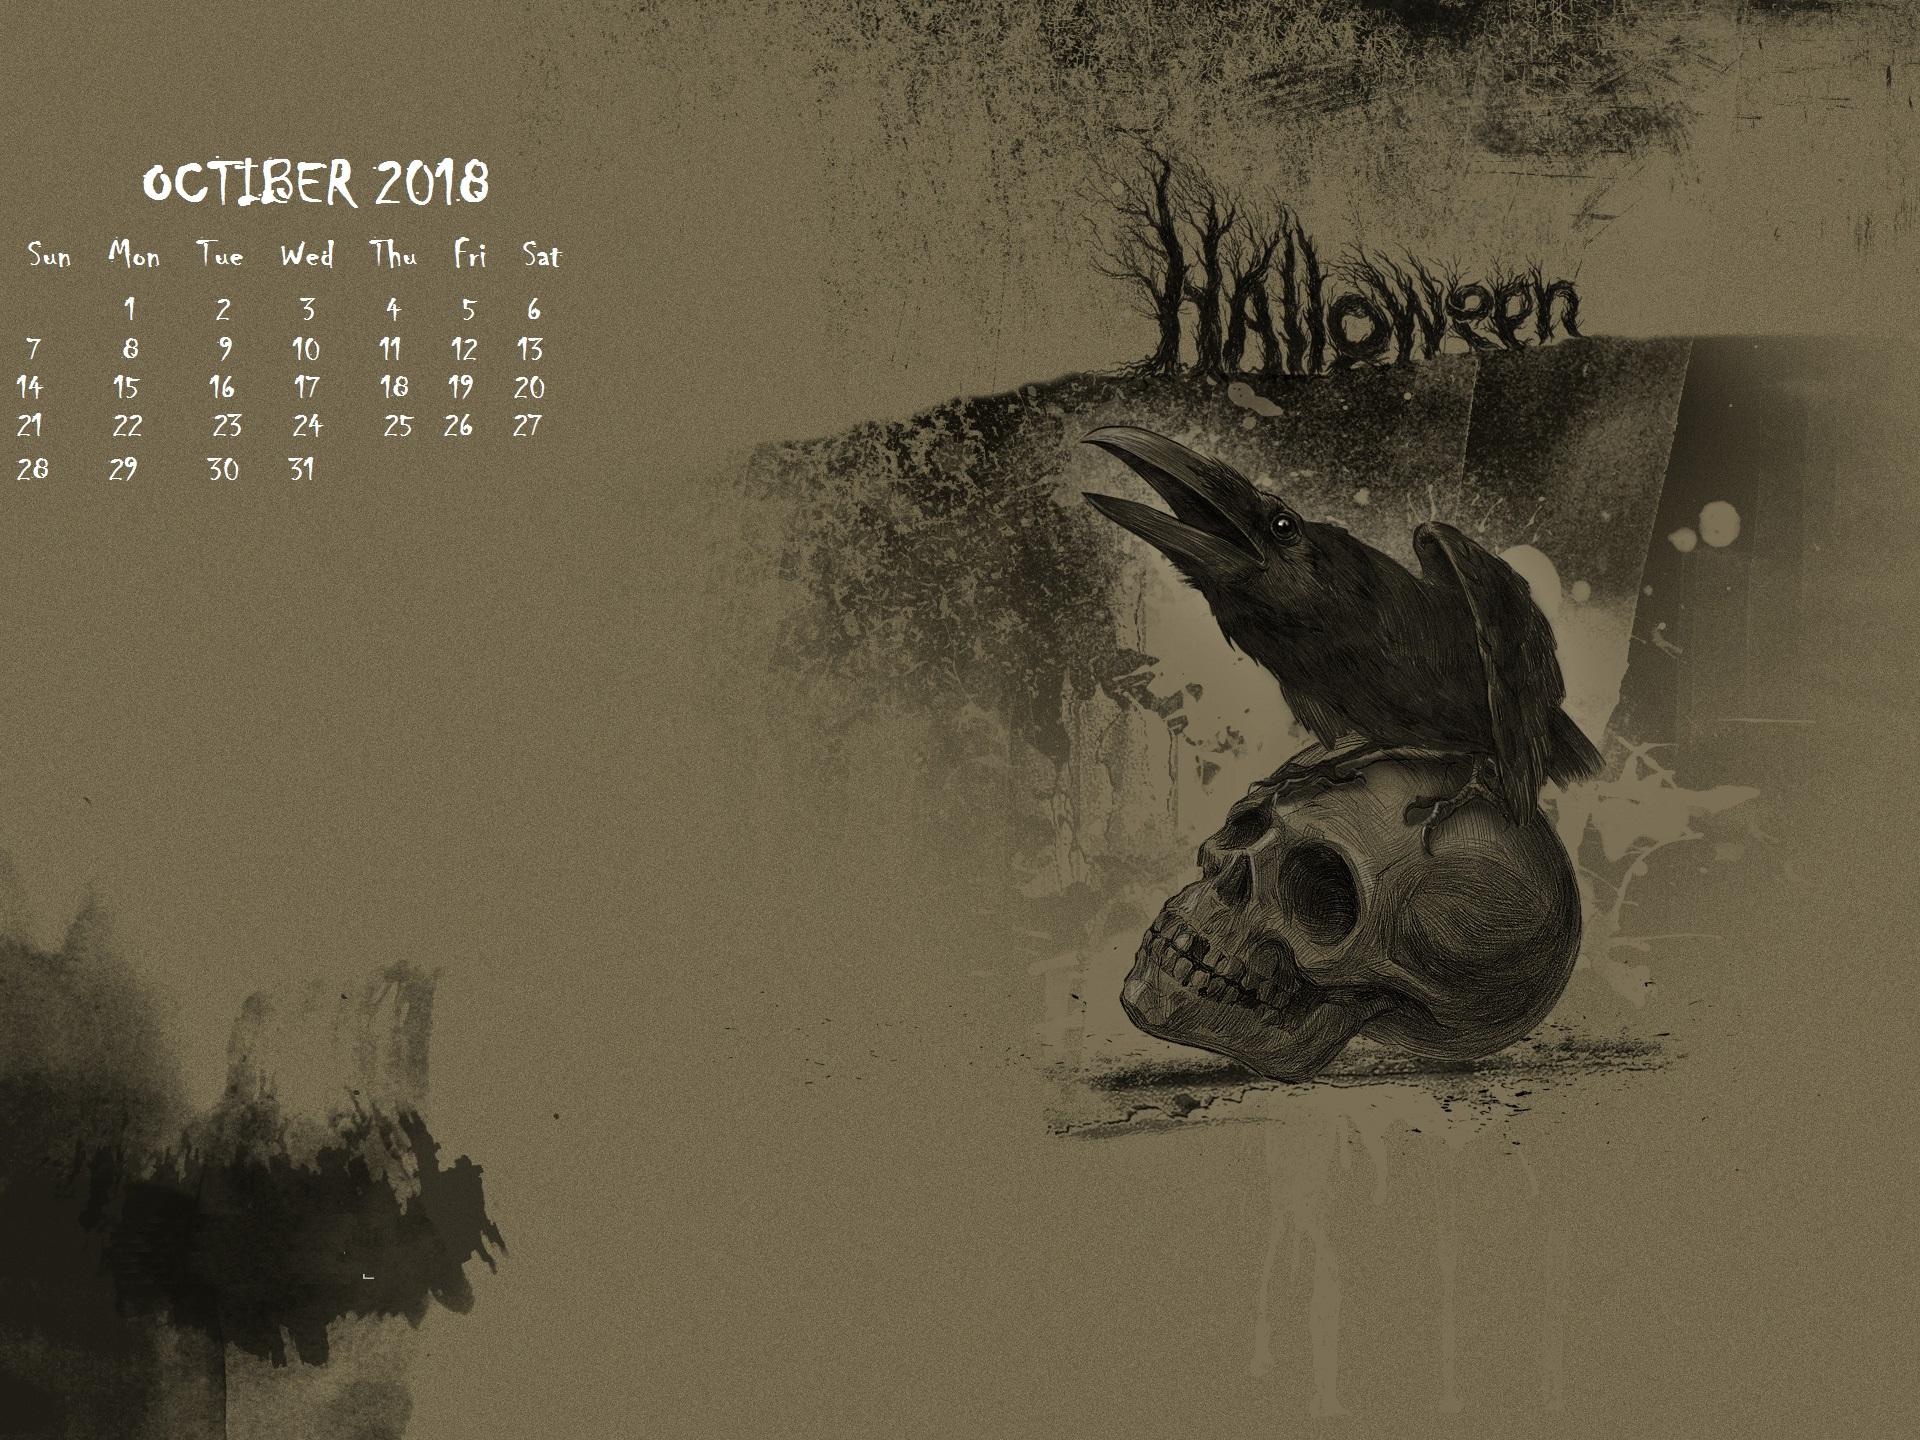 October 2018 Screensaver Backgrounds Calendar 2018 1920x1440